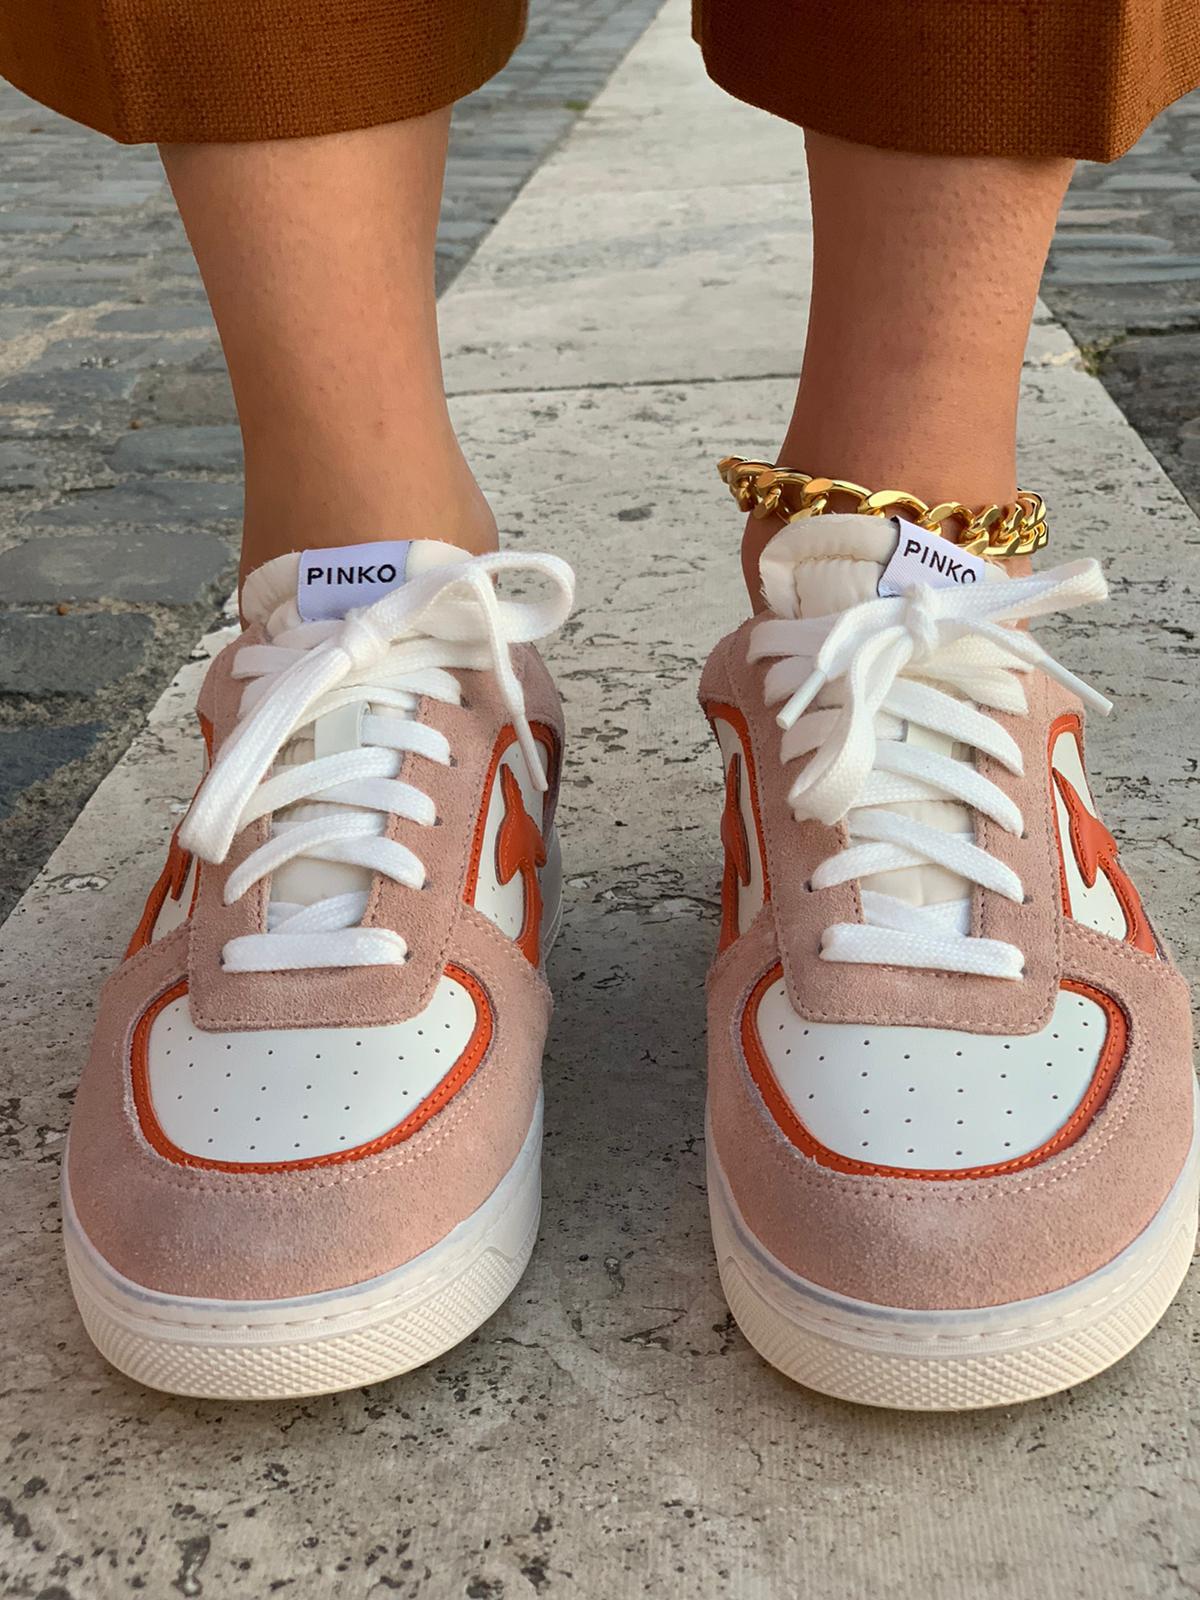 Sneaker Liquirizia low top 3 in pelle Pinko